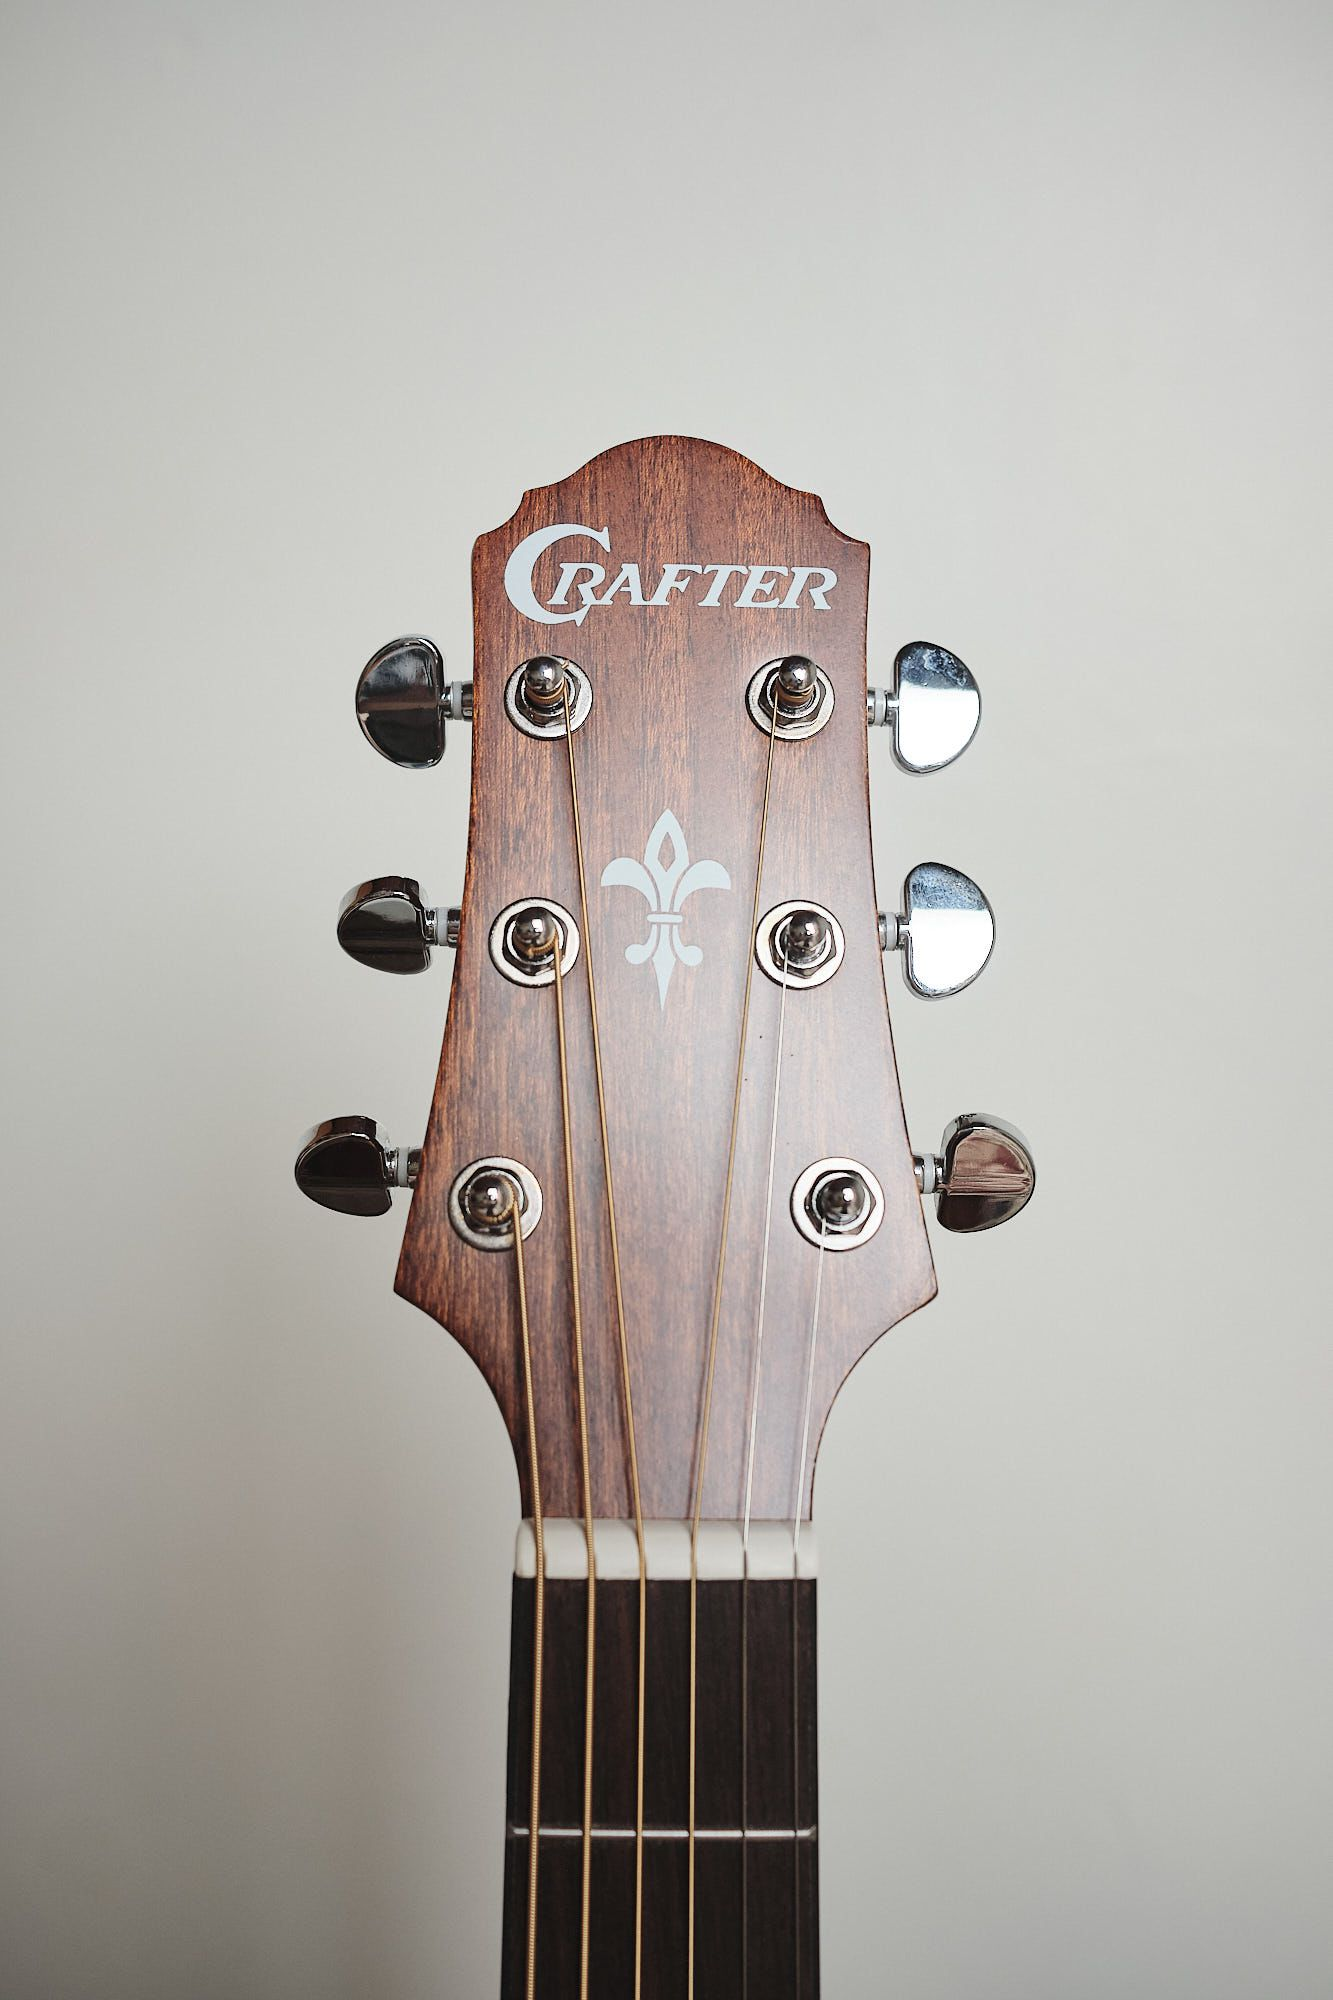 Violão Aço Crafter Orchestra Cutway Eq Cr-t Nat Fosco Ht-100